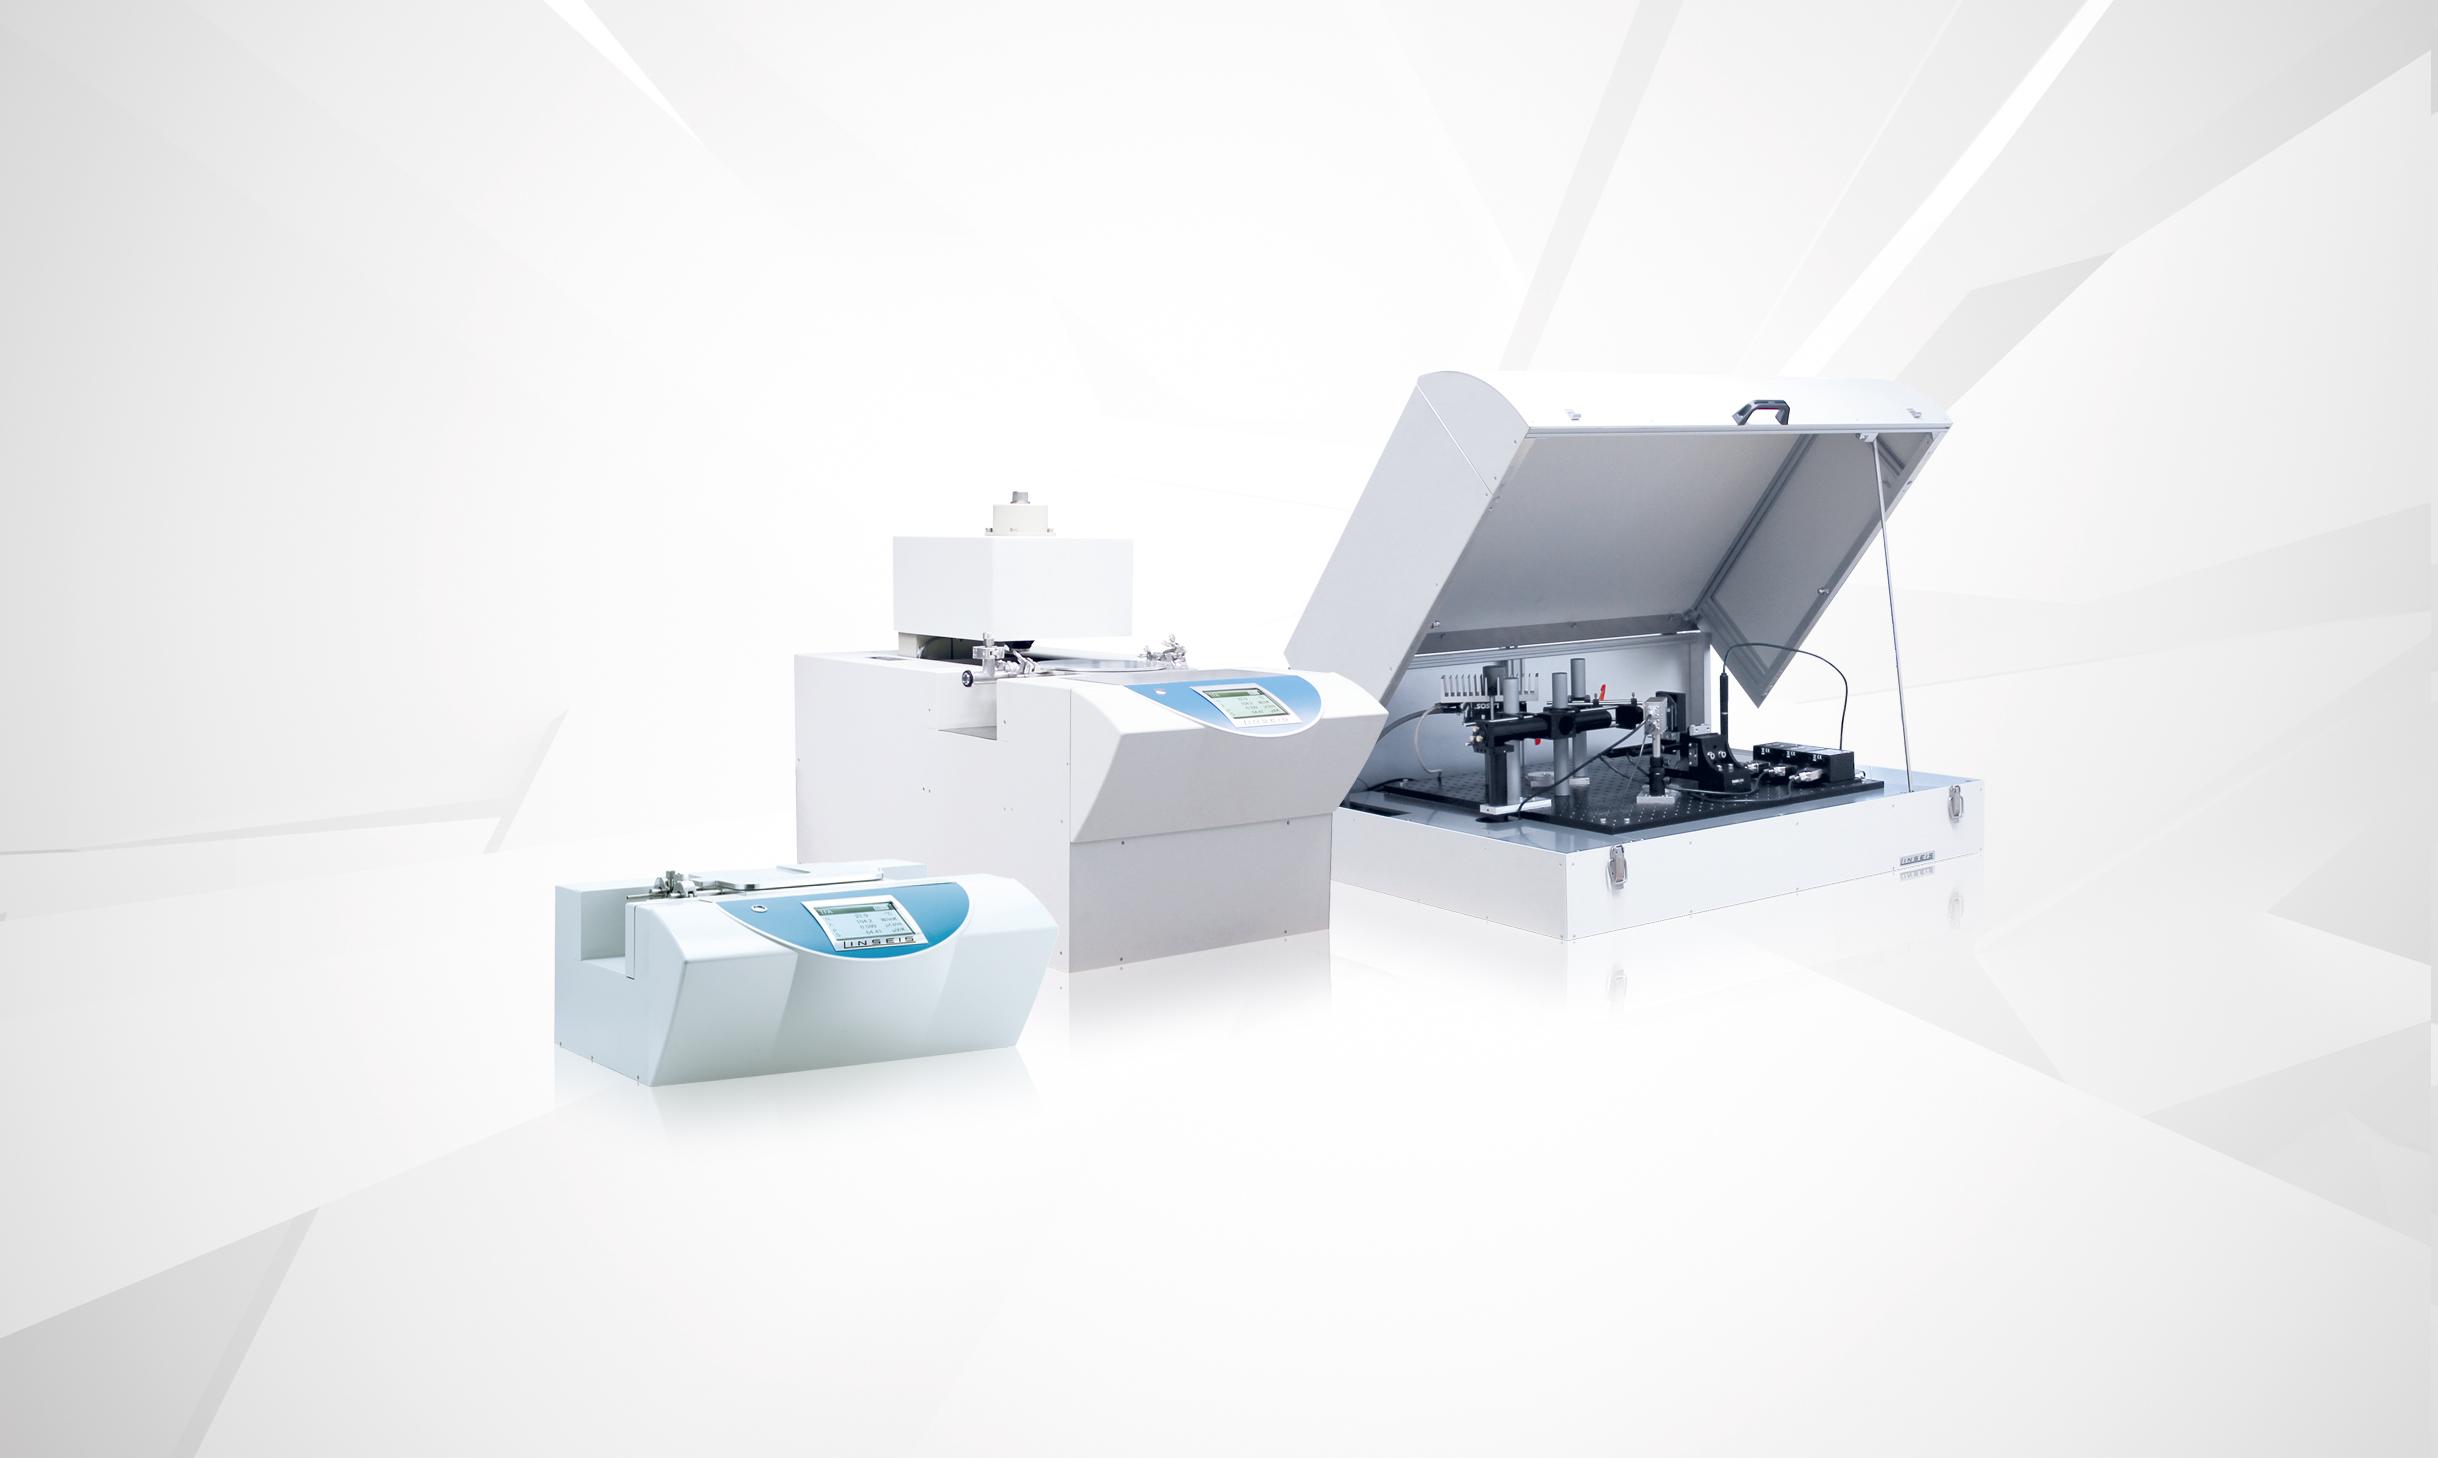 Thin Film Analysis - thermal conductivity